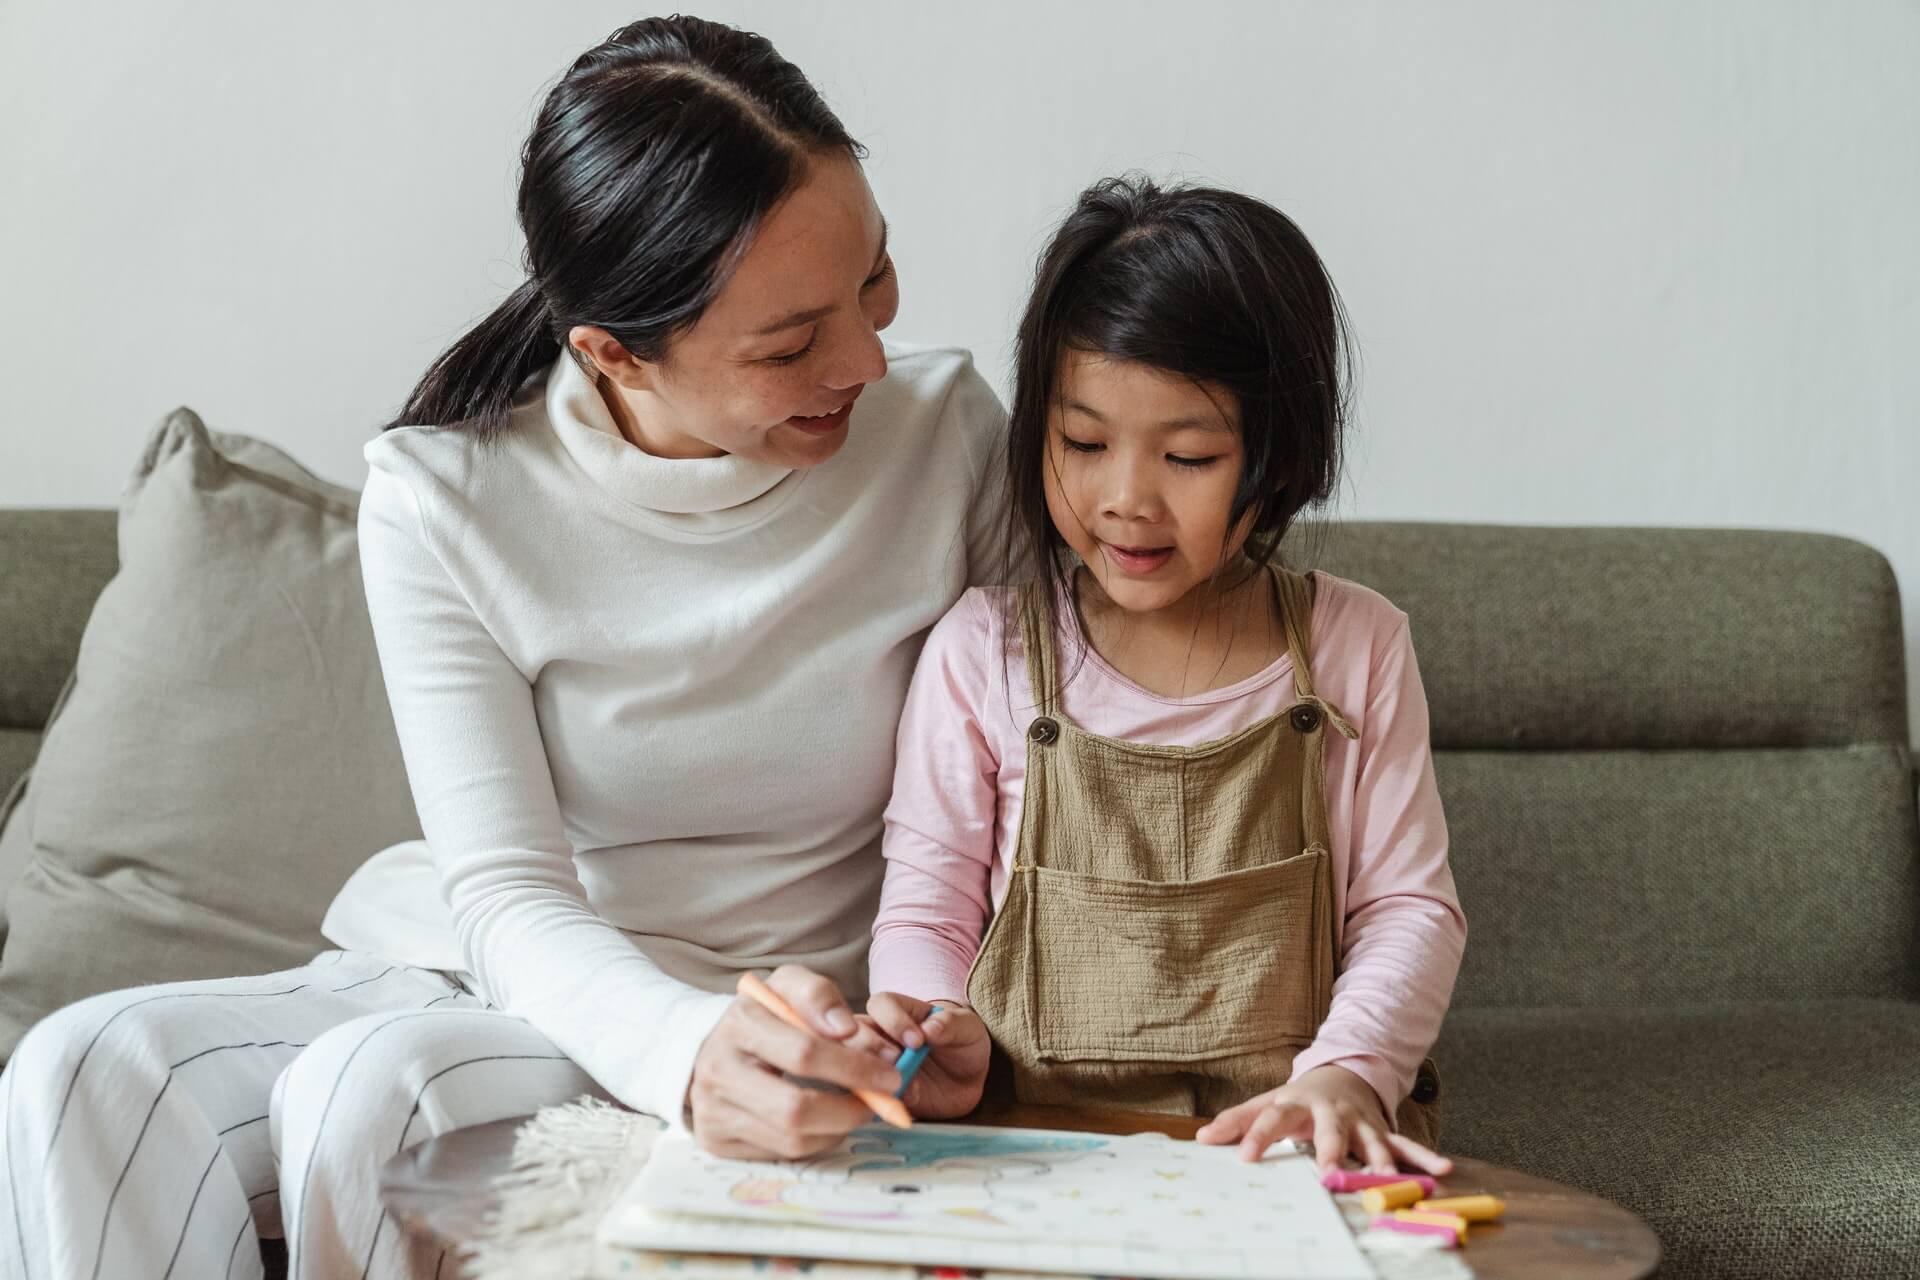 Child Occupancy Laws